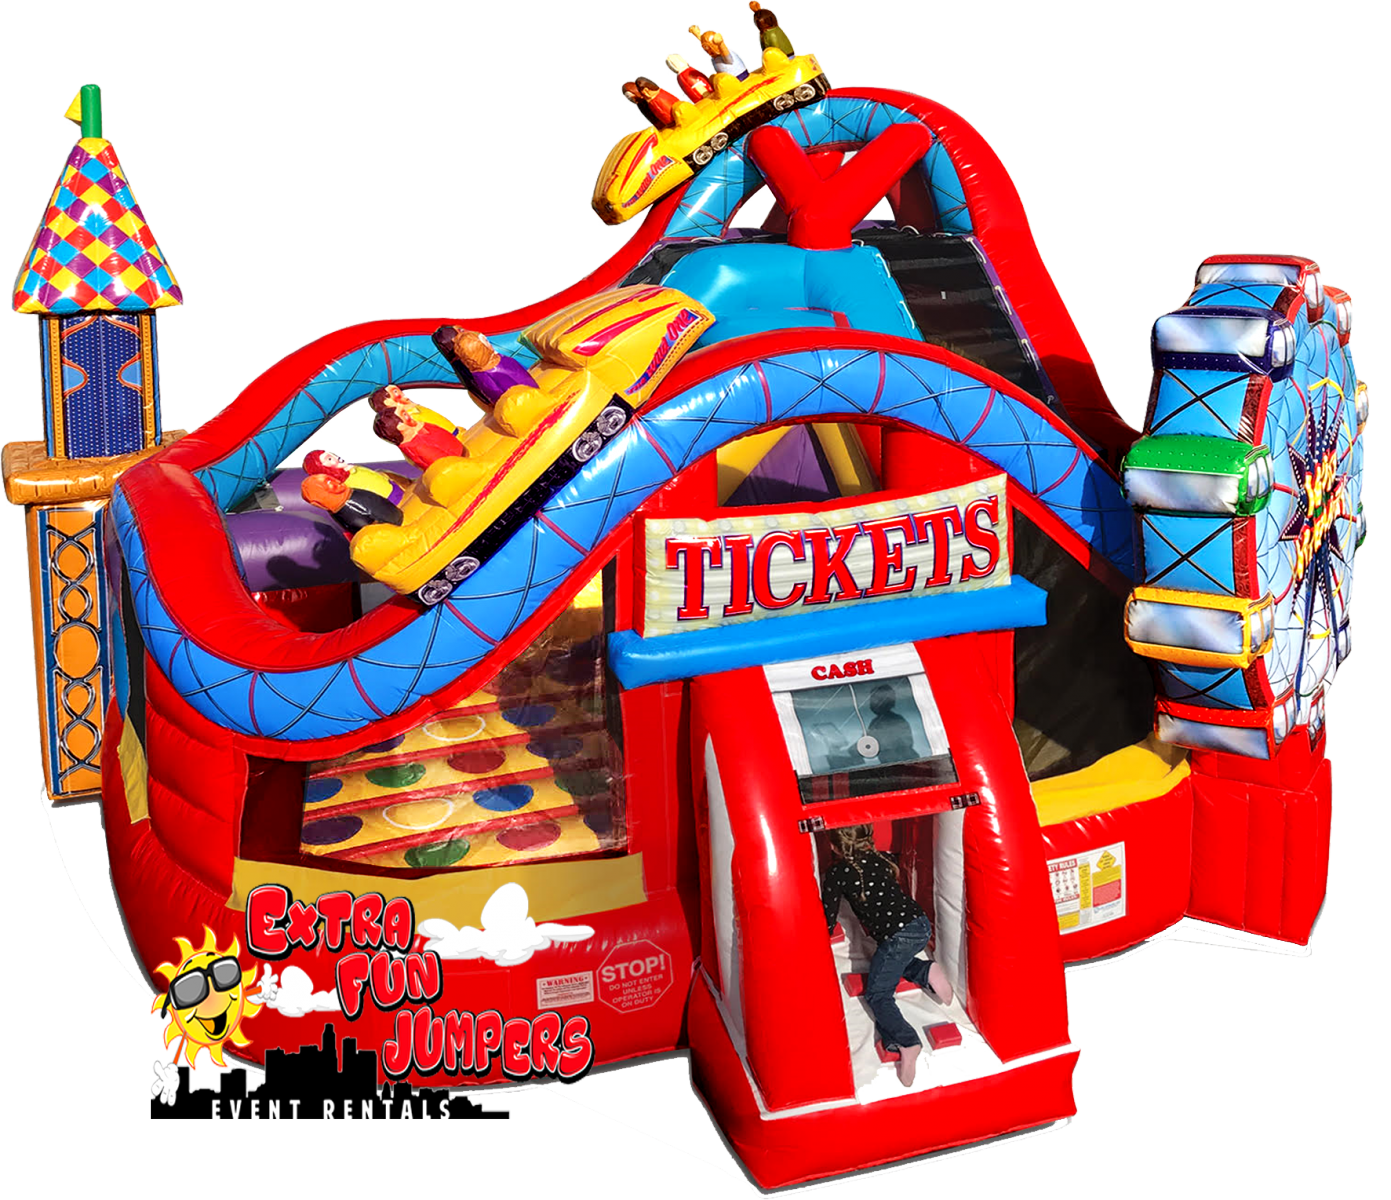 Games clipart funfair game. Carnival kid zone school